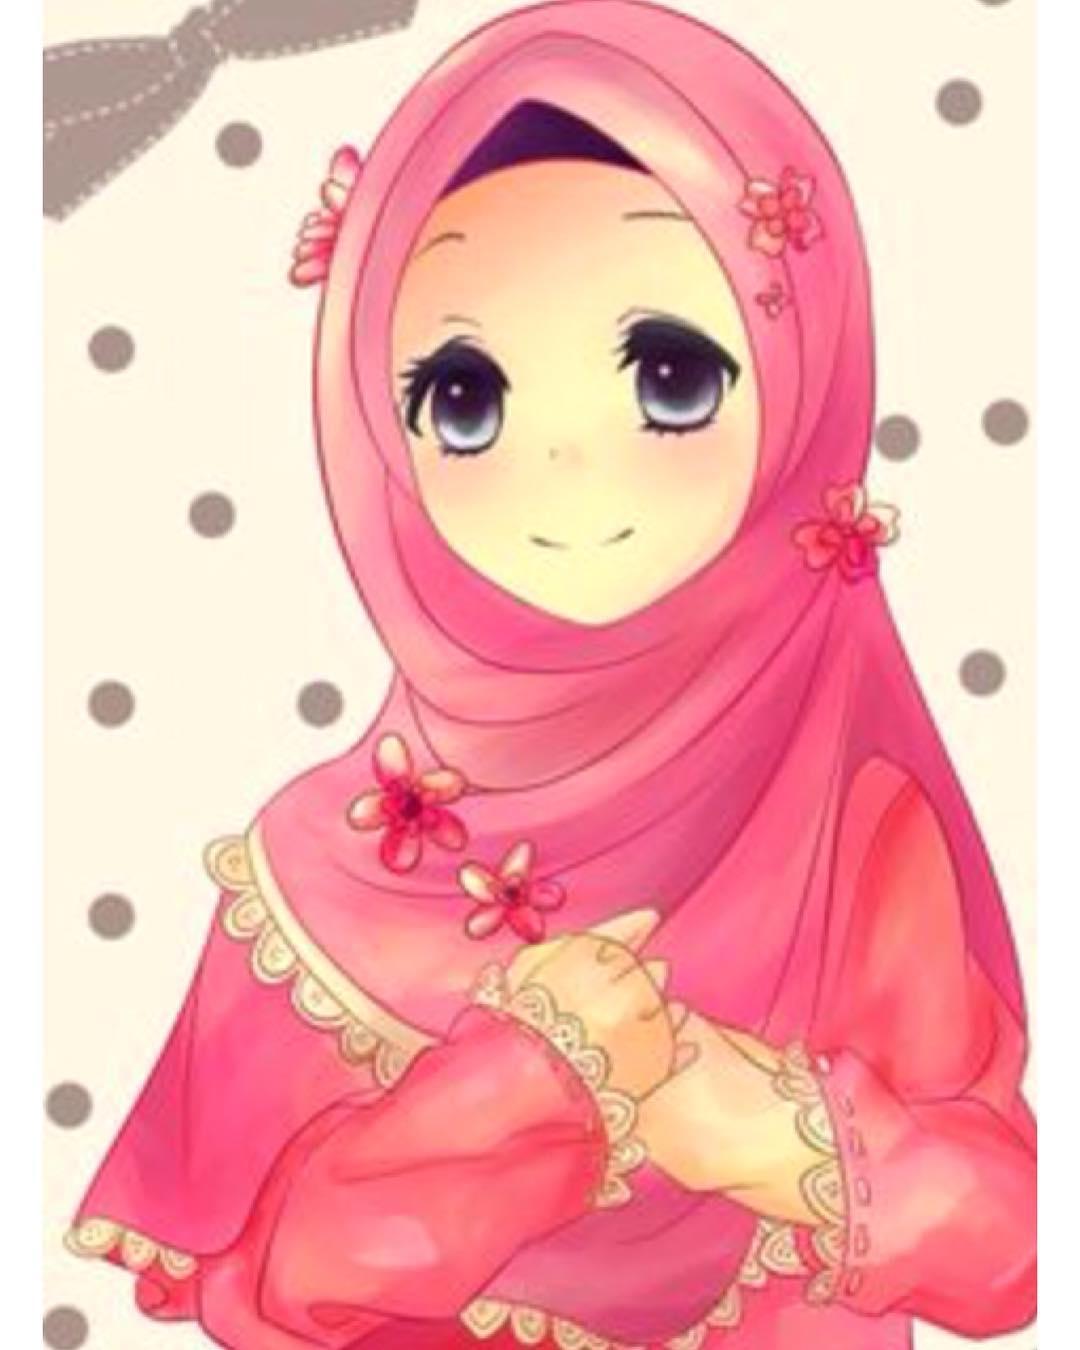 N Anime Character : Me as an anime character fatima begum